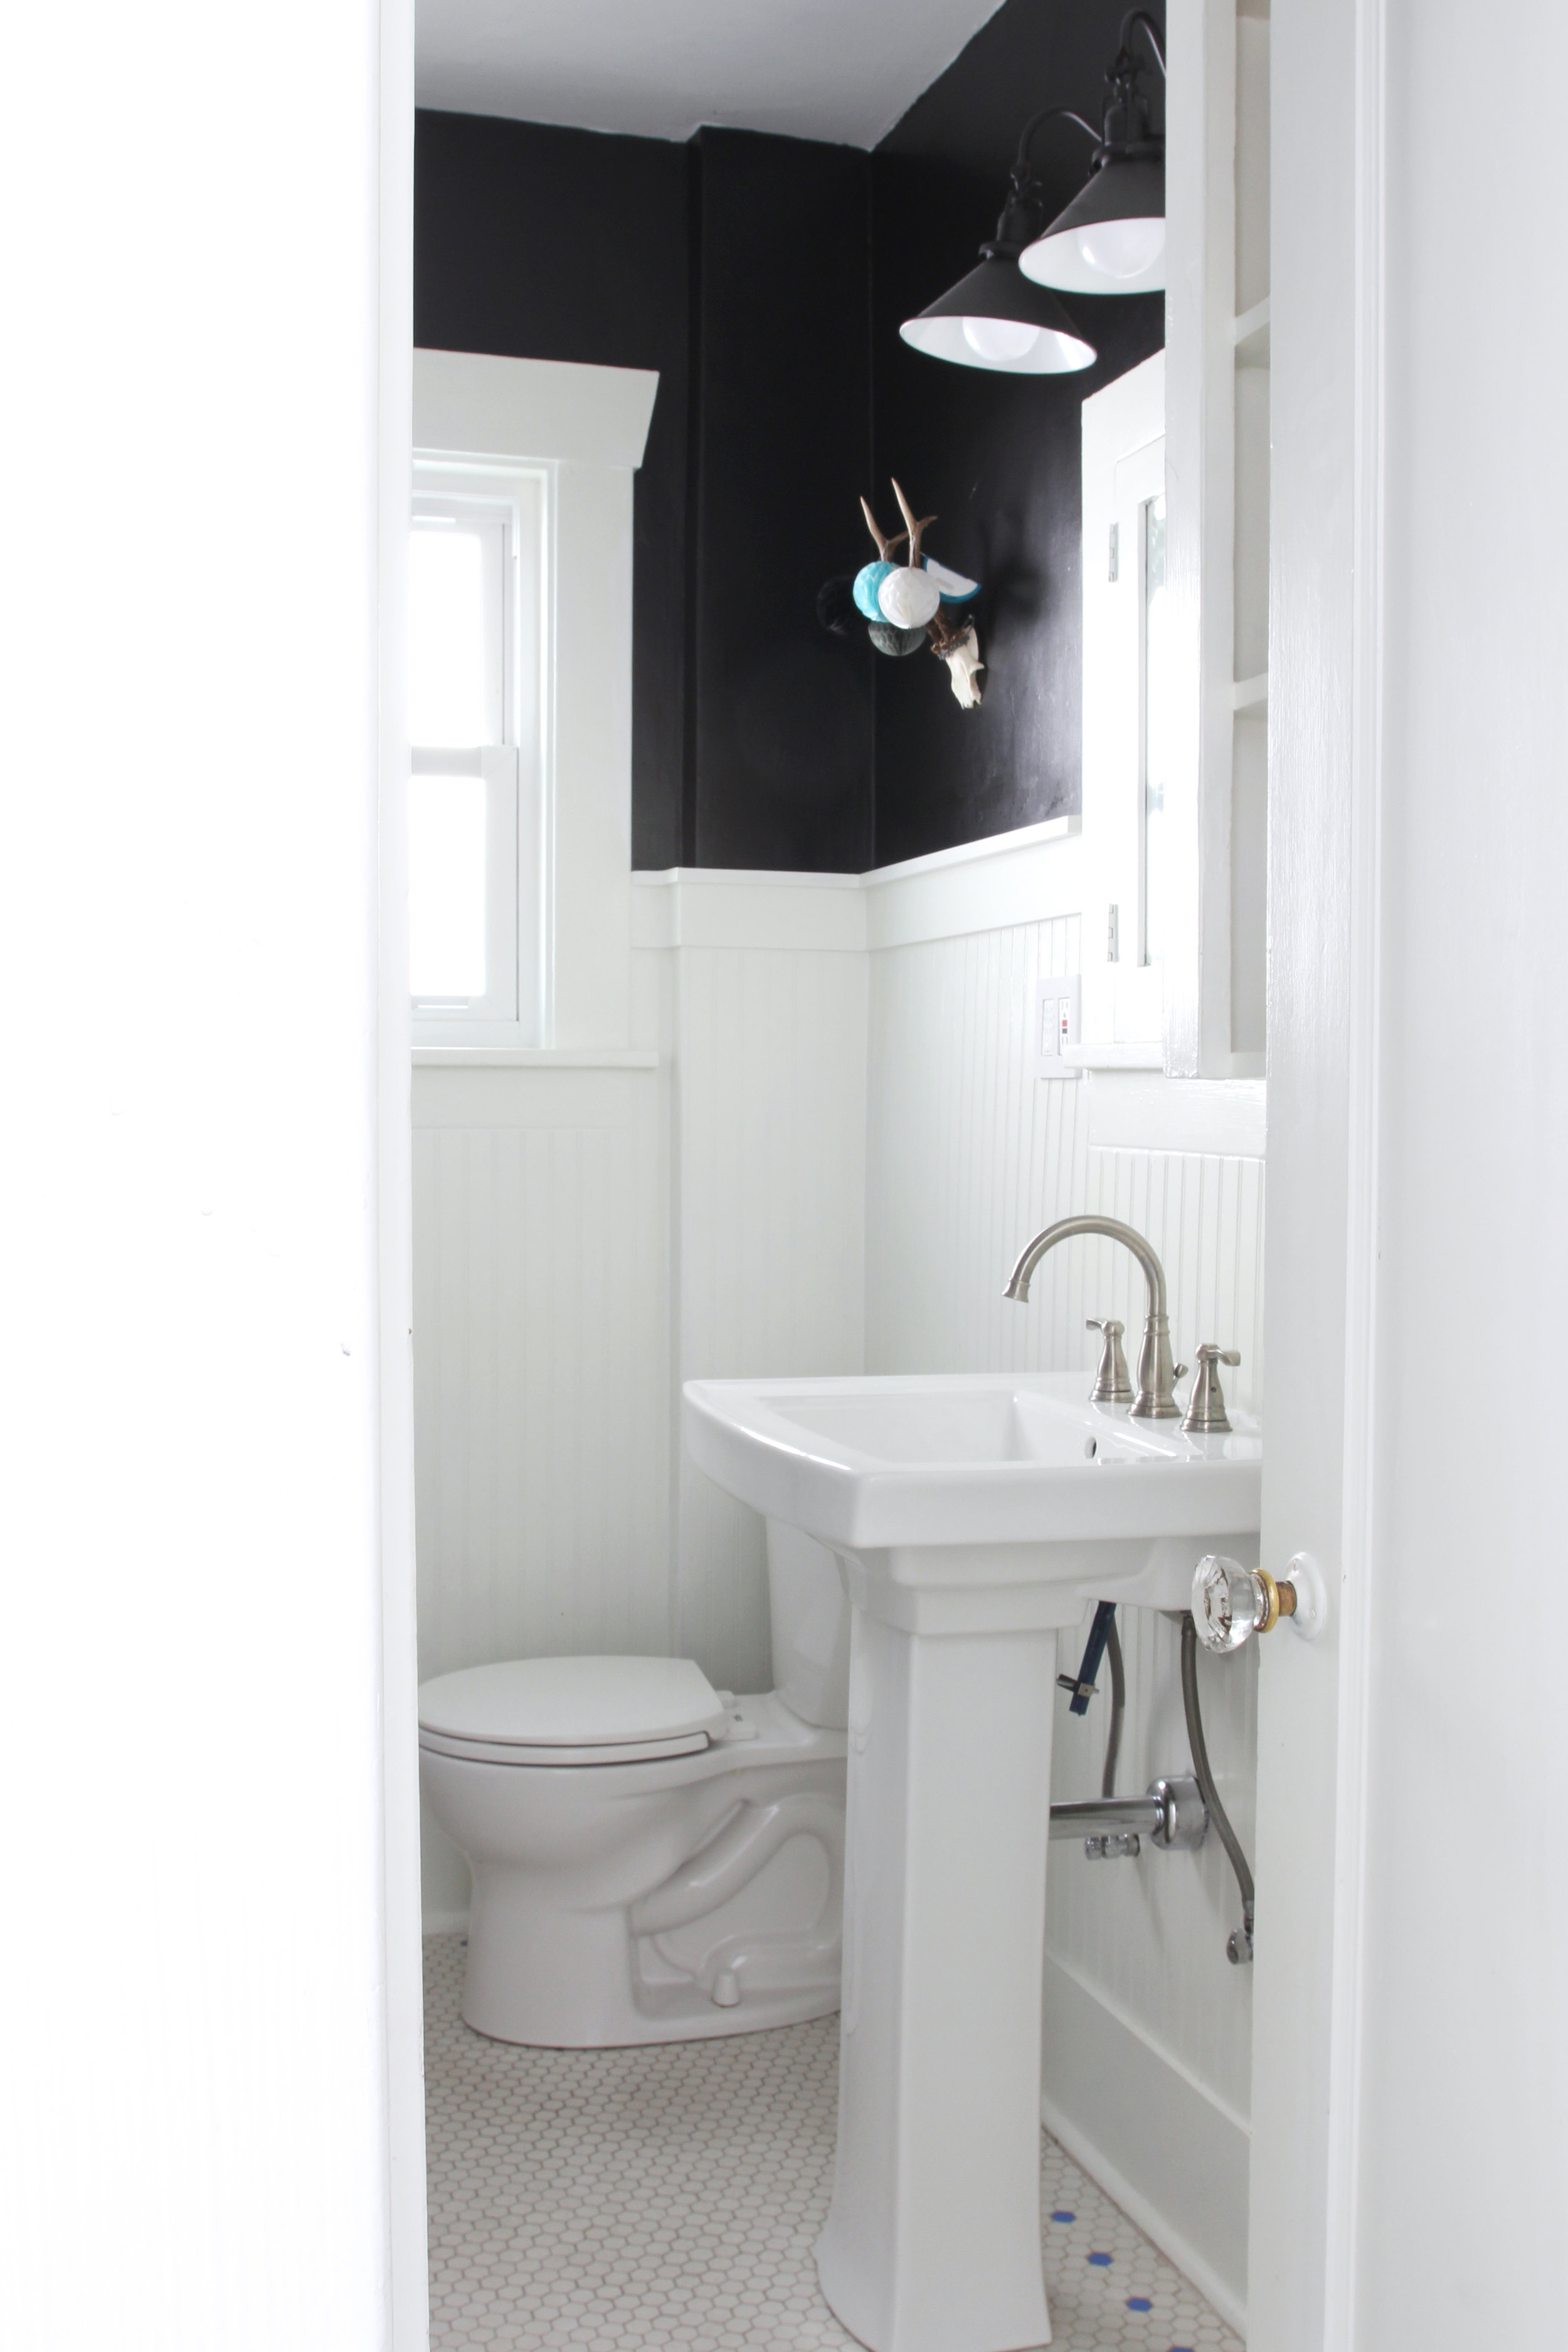 The Grit and Polish - Dexter Bathroom Refresh Under $1000 3.jpg